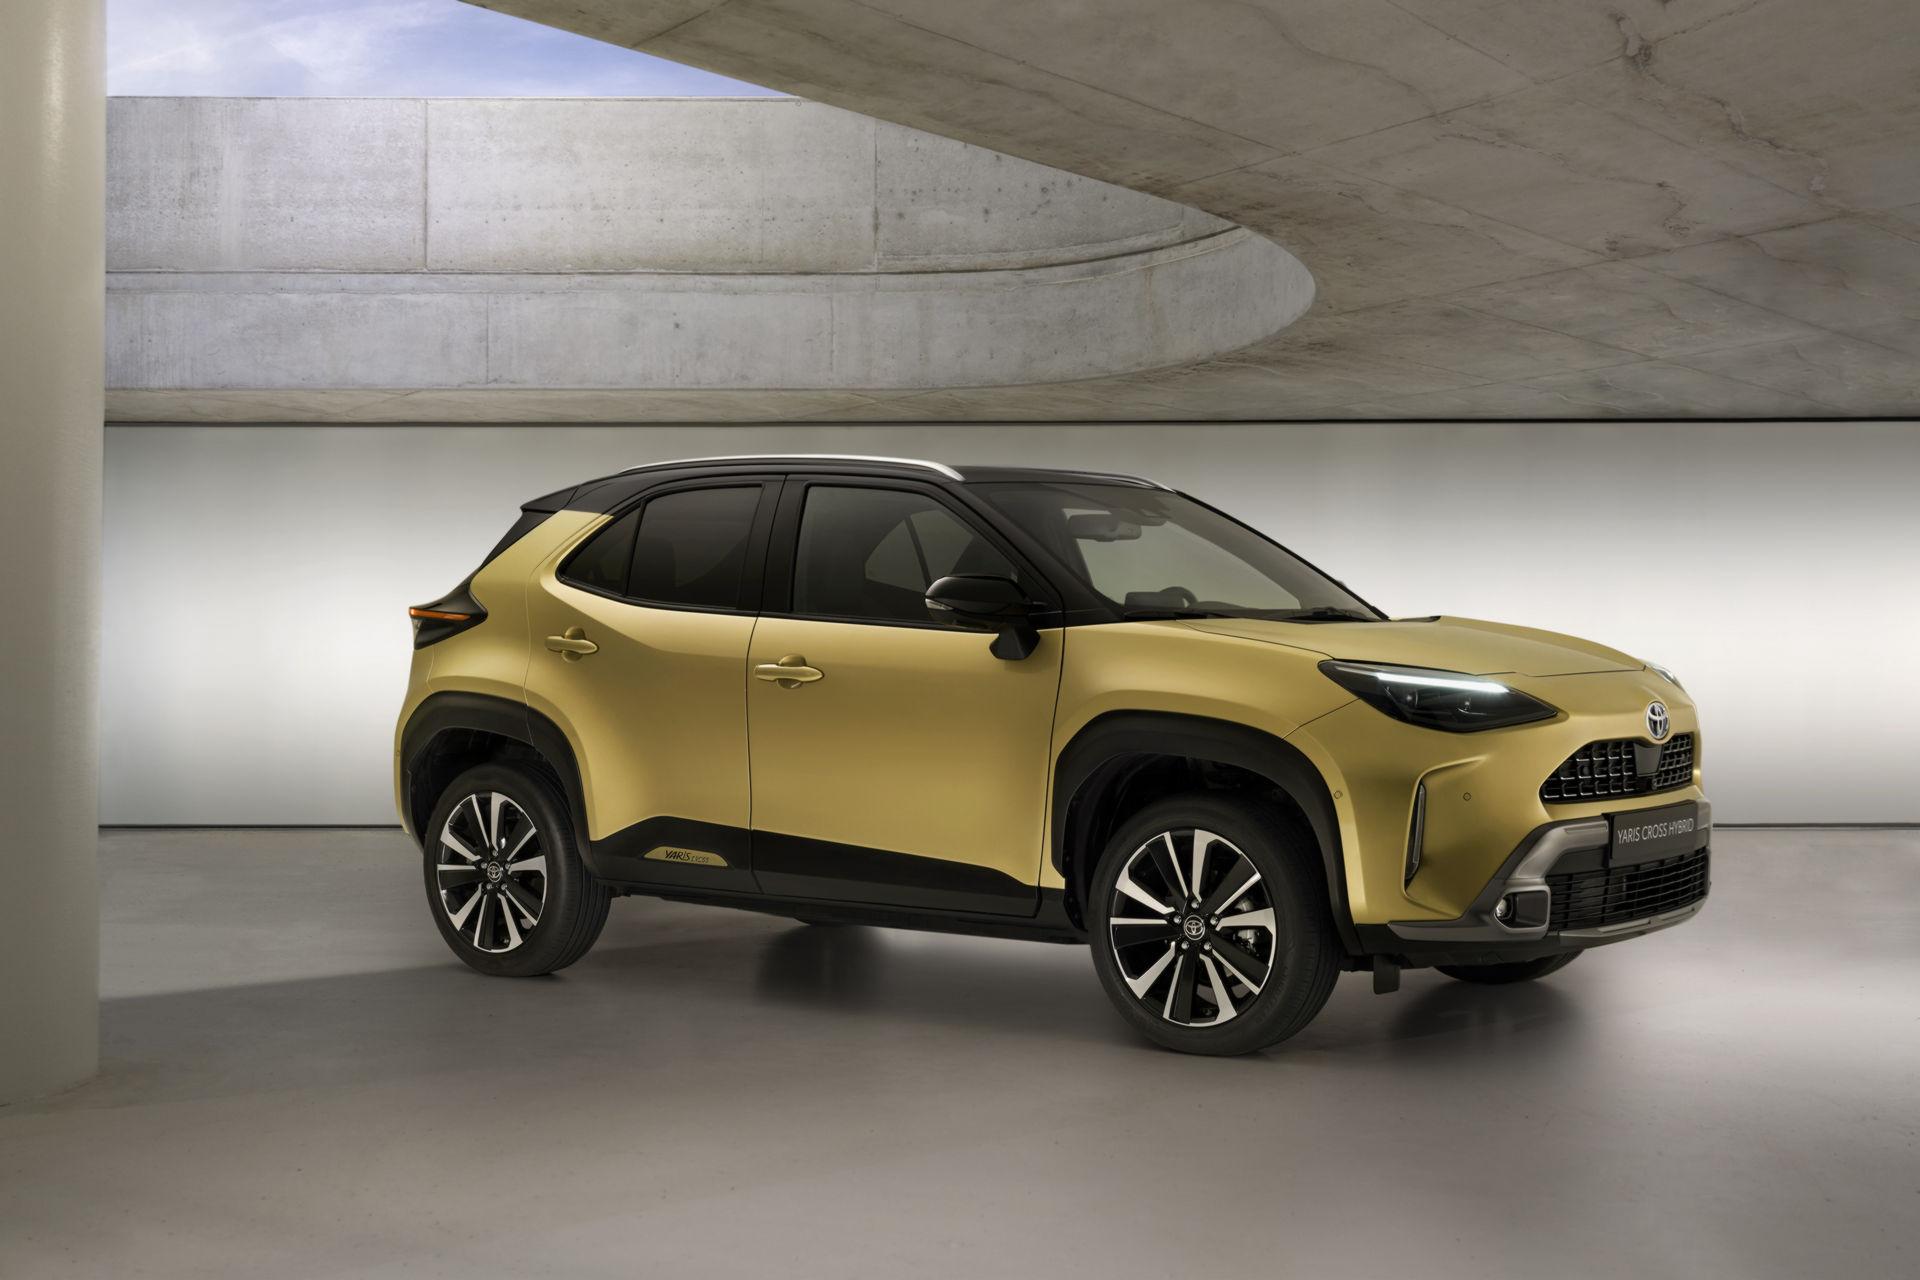 Toyota Yaris Cross Adventure to podwyzszony crossover